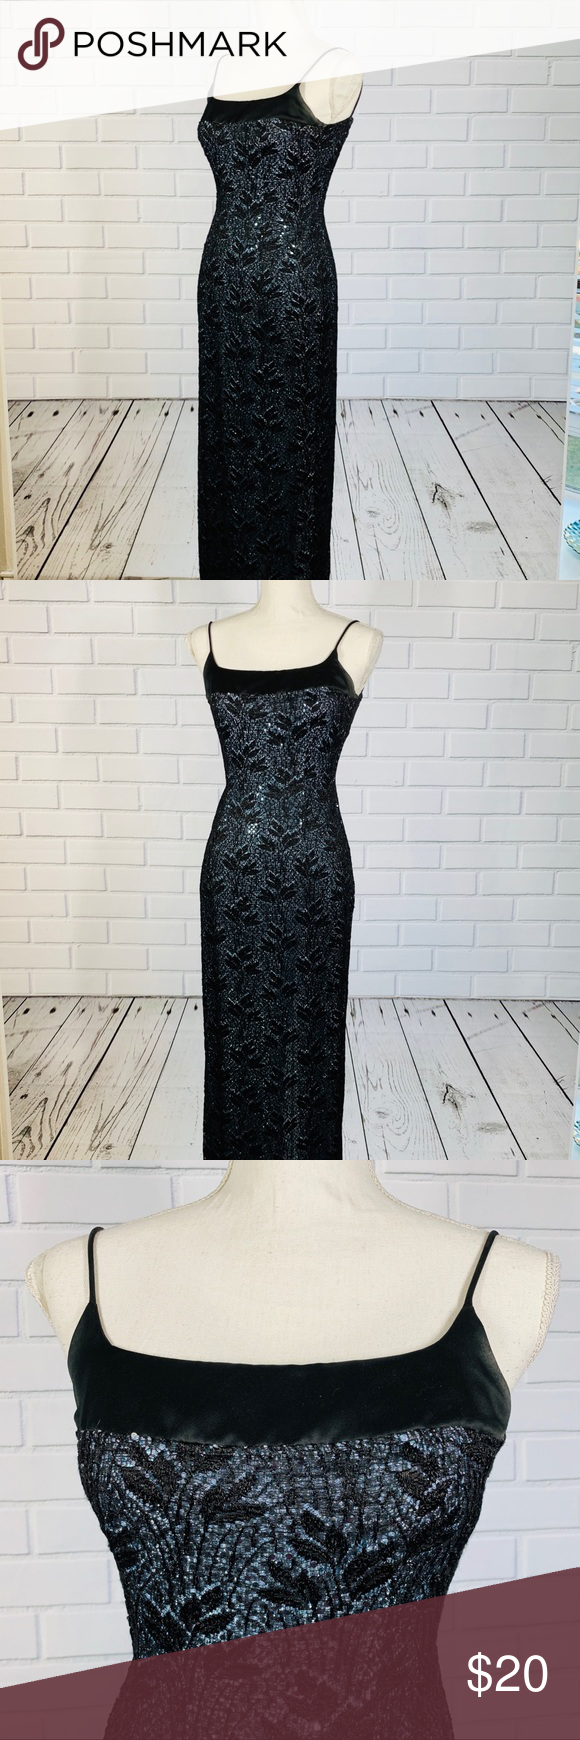 Morgan Co Blue Sequin Black Lace Prom Dress Black Lace Prom Dress Prom Dresses Lace Vintage Lace Prom Dress [ 1740 x 580 Pixel ]